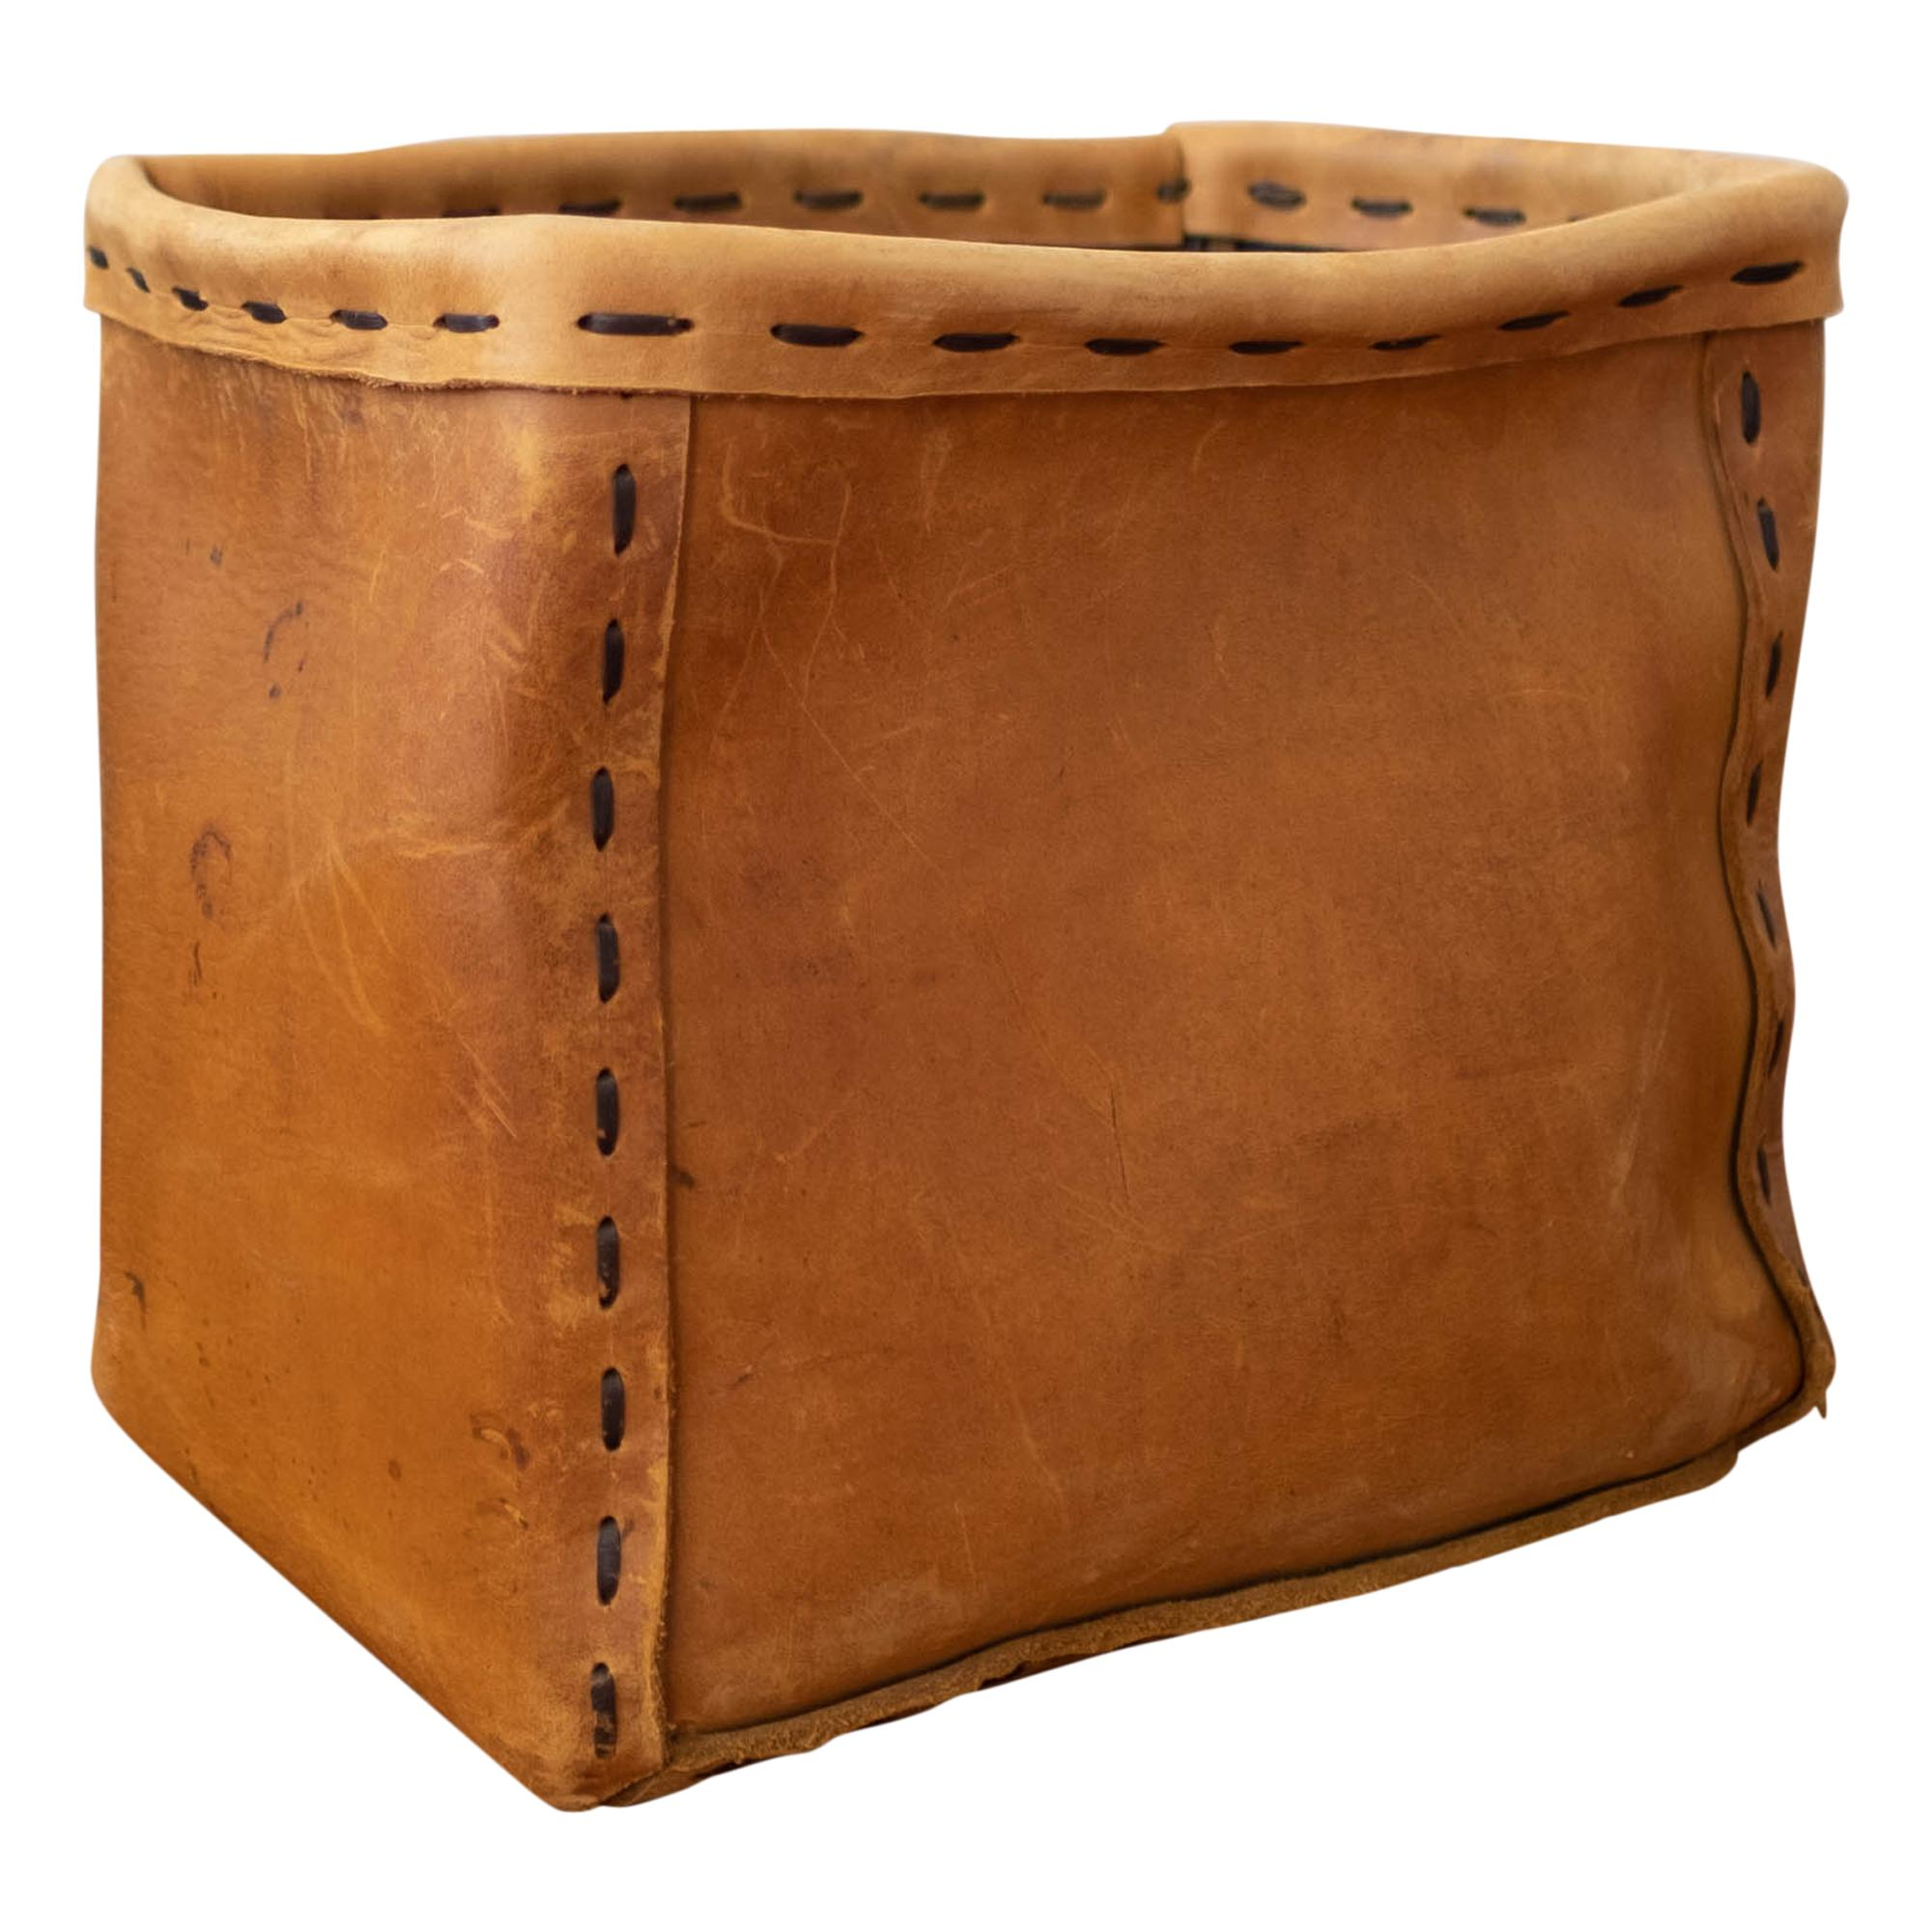 1960s Leather Waste Basket